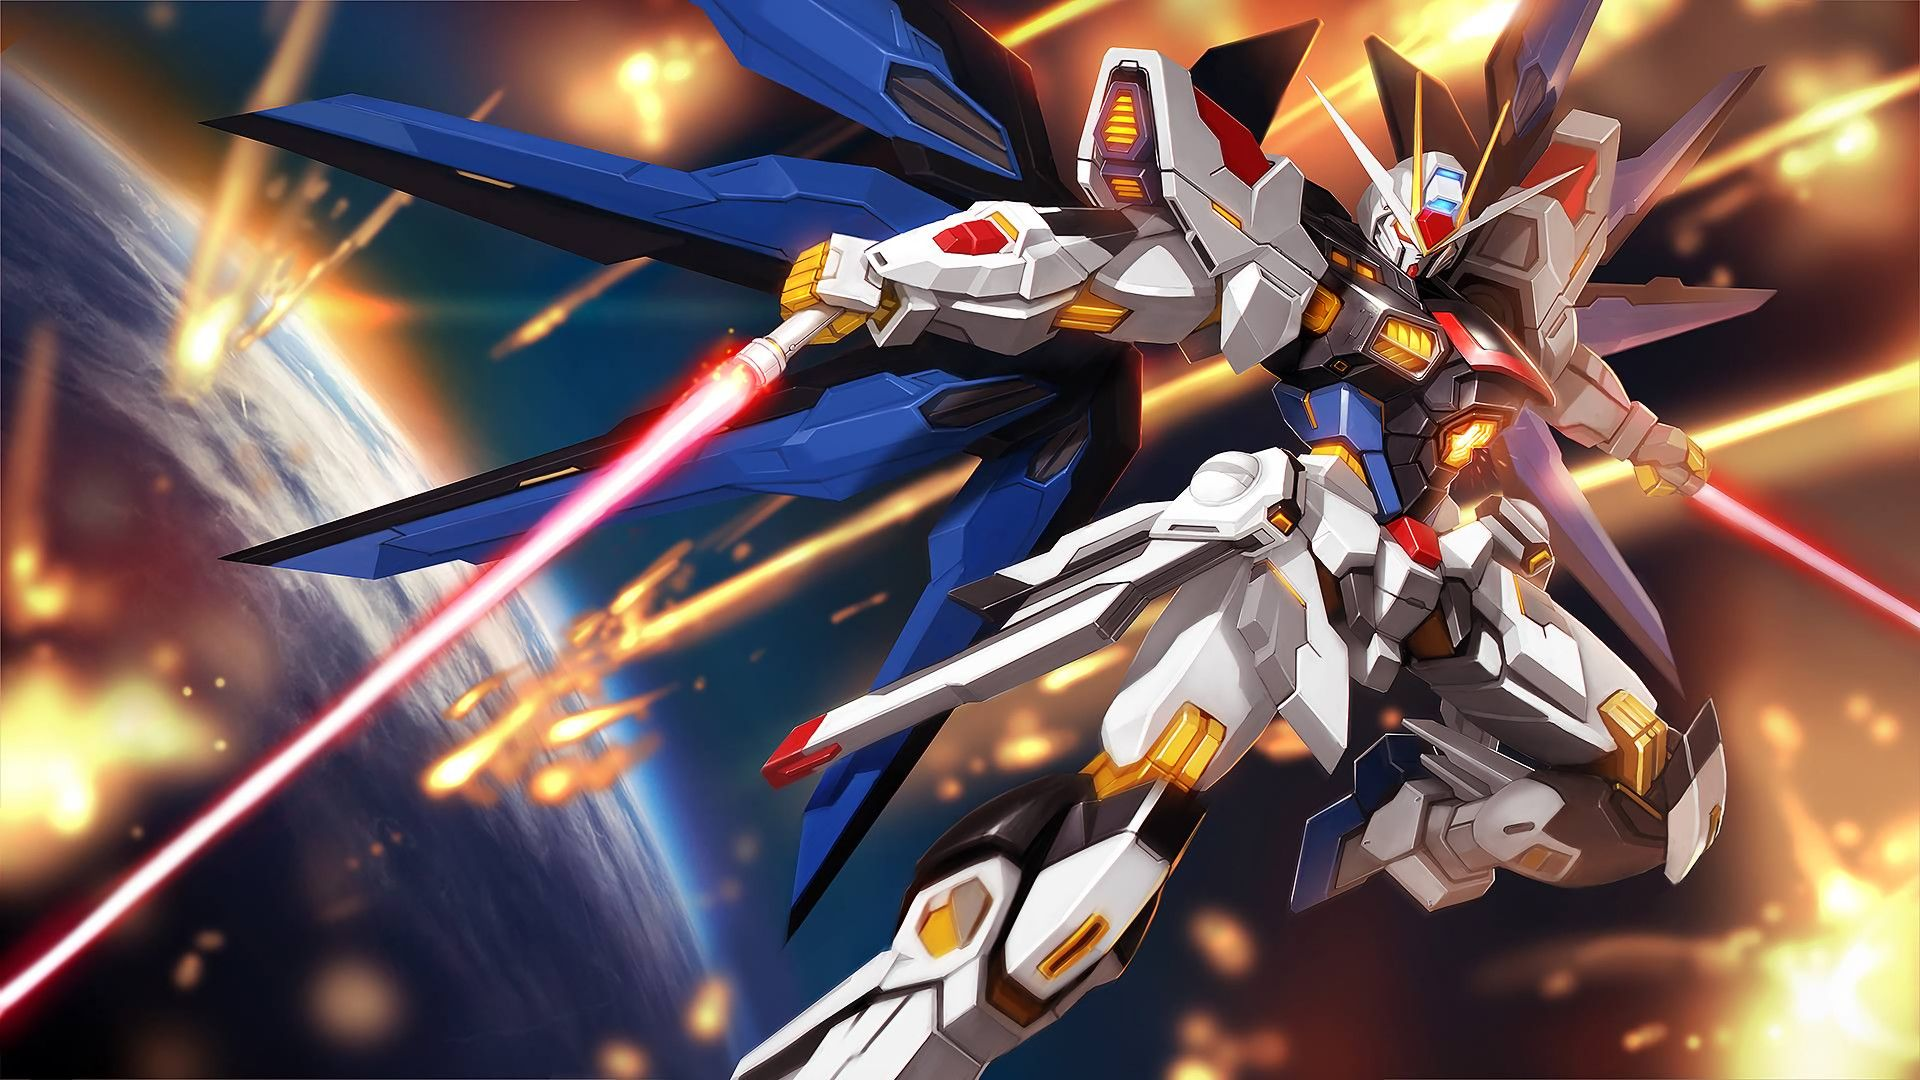 New Gundam Wallpaper 1920x1080 1920x1080 Gundam Wallpapers Gundam Seed Gundam